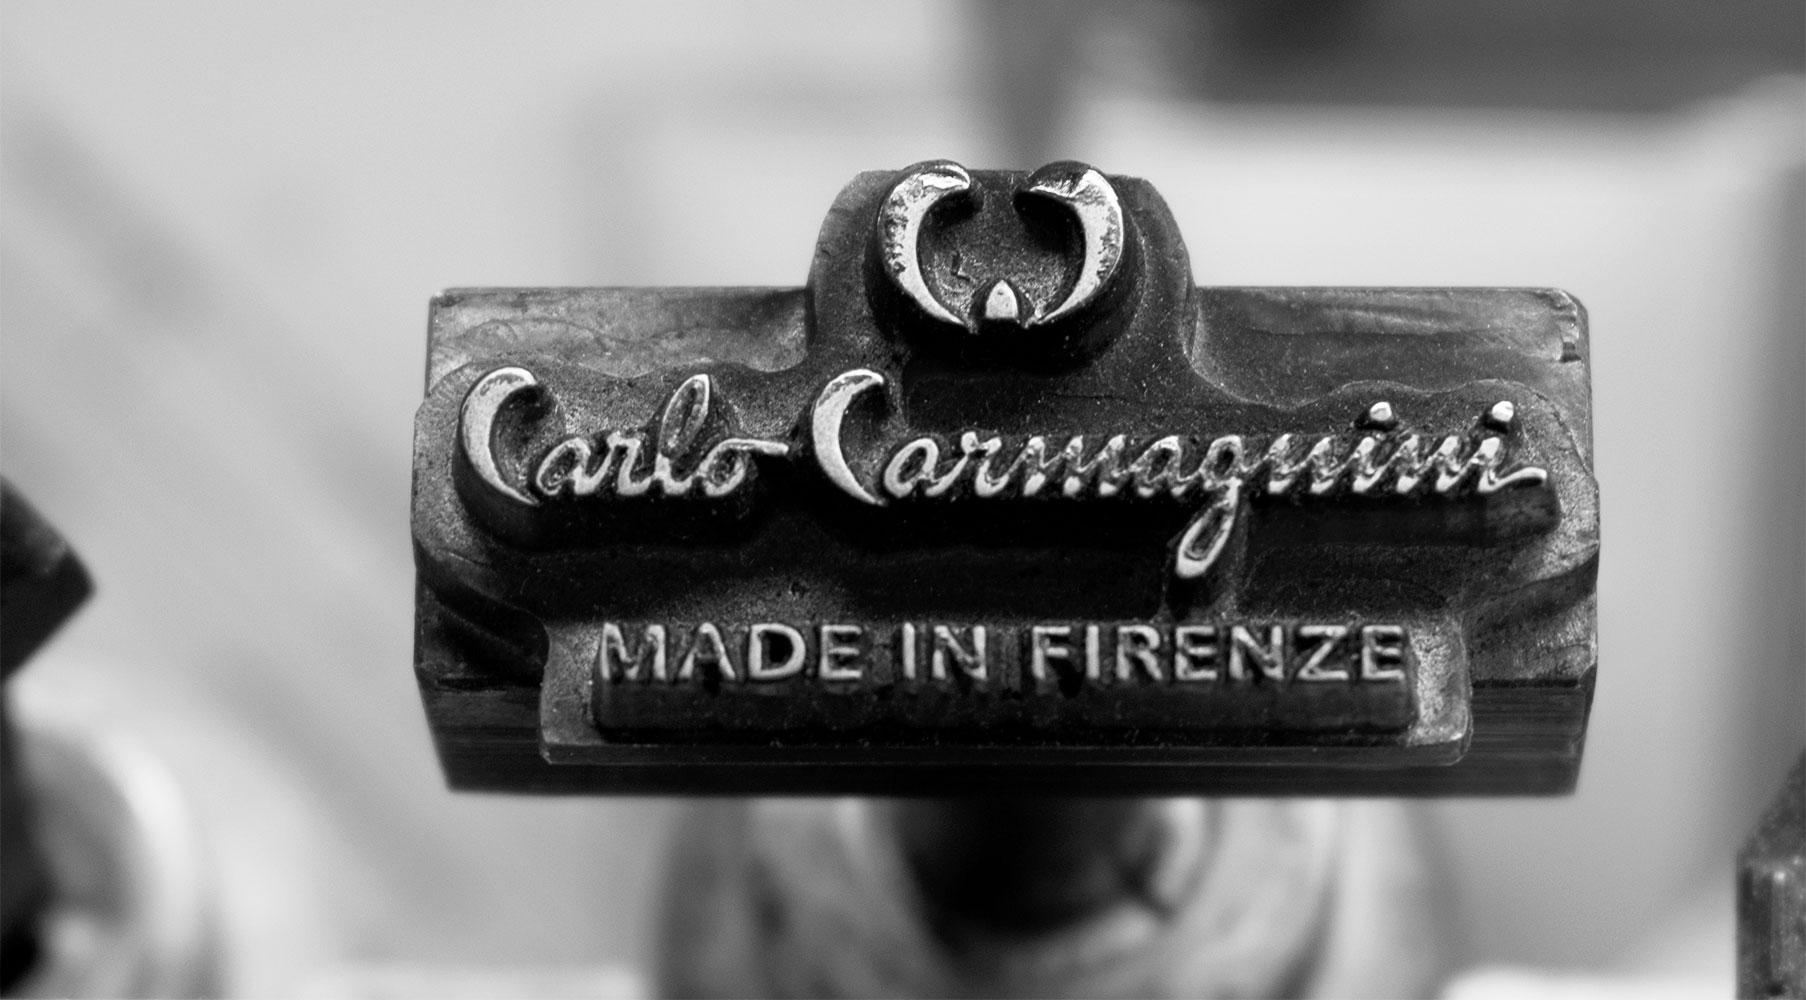 carlocarmagnini, madeinitaly, madeinfirenze